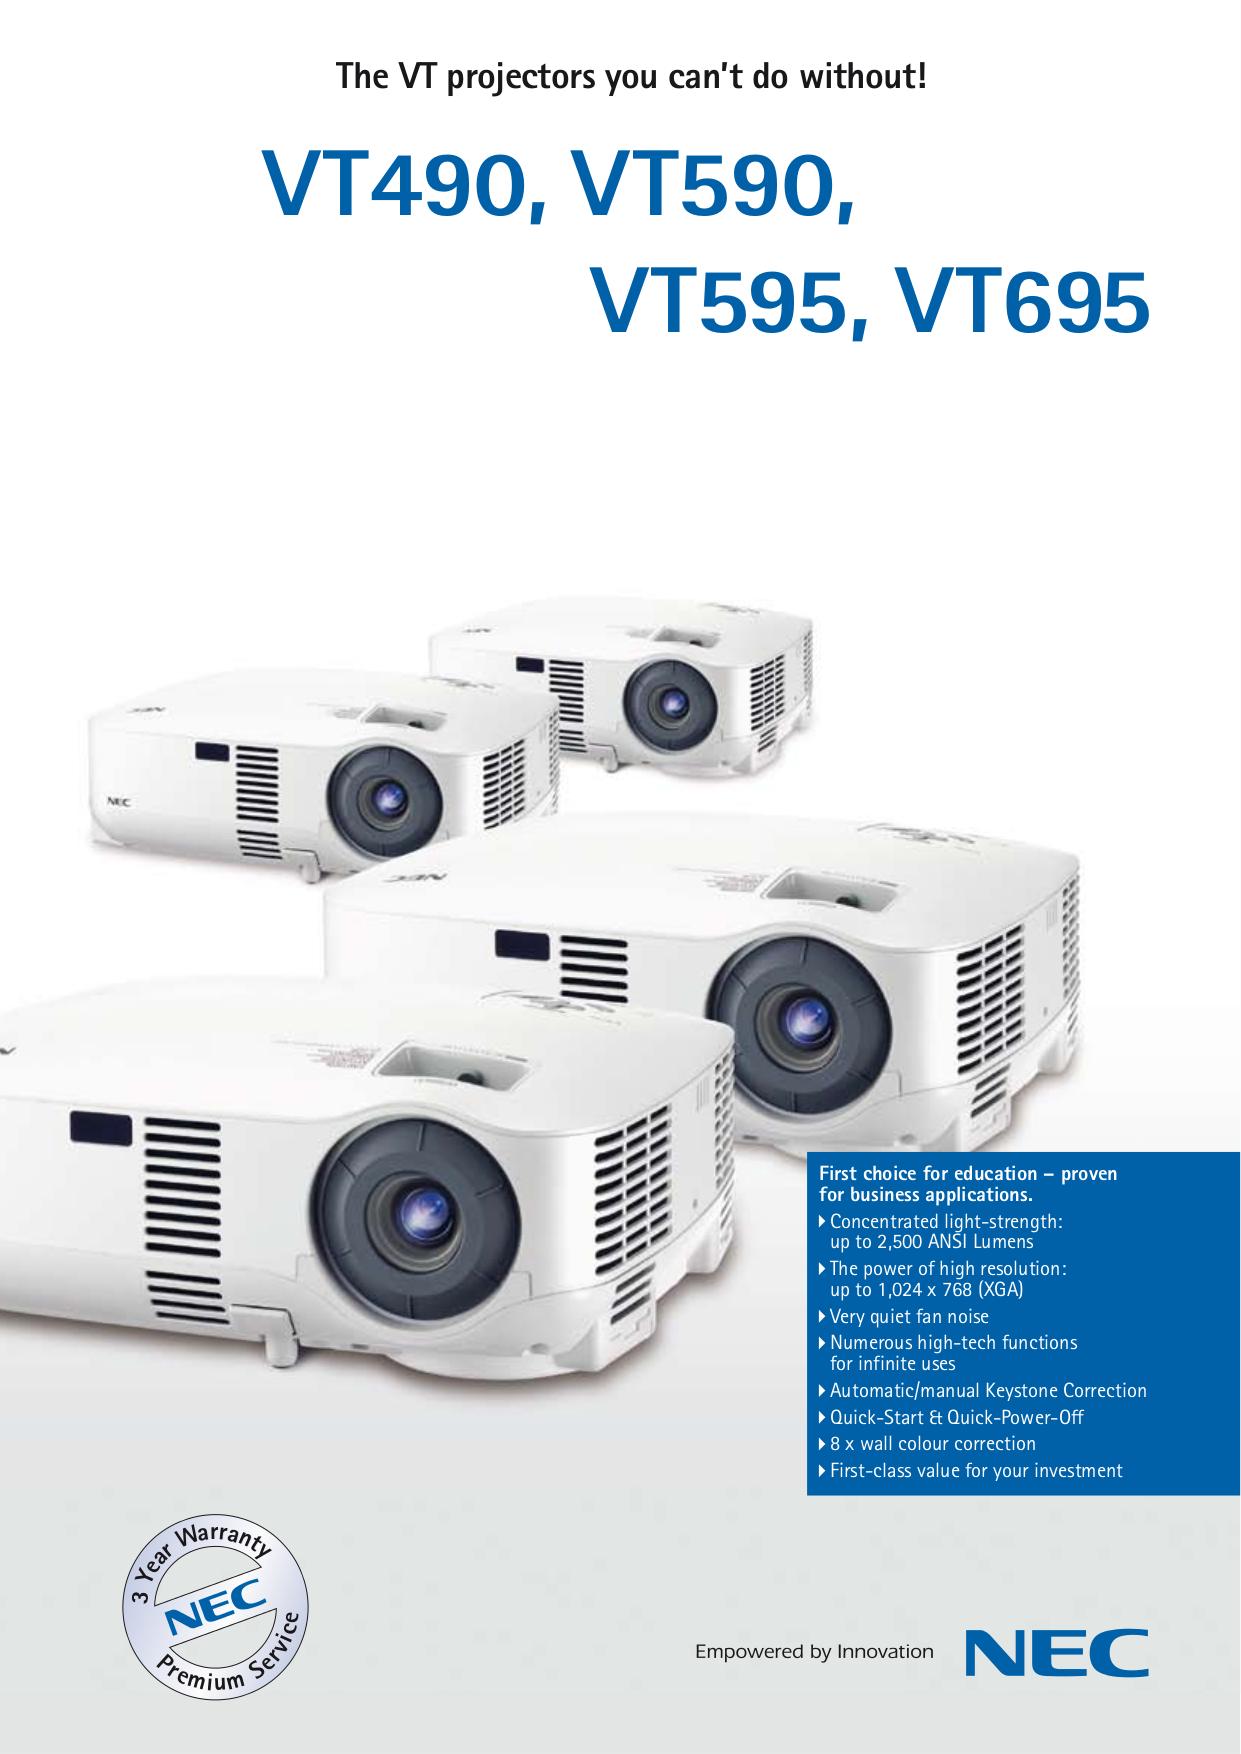 nec vt695 manual product user guide instruction u2022 rh testdpc co NEC VT695 Specs NEC VT695 Lamp